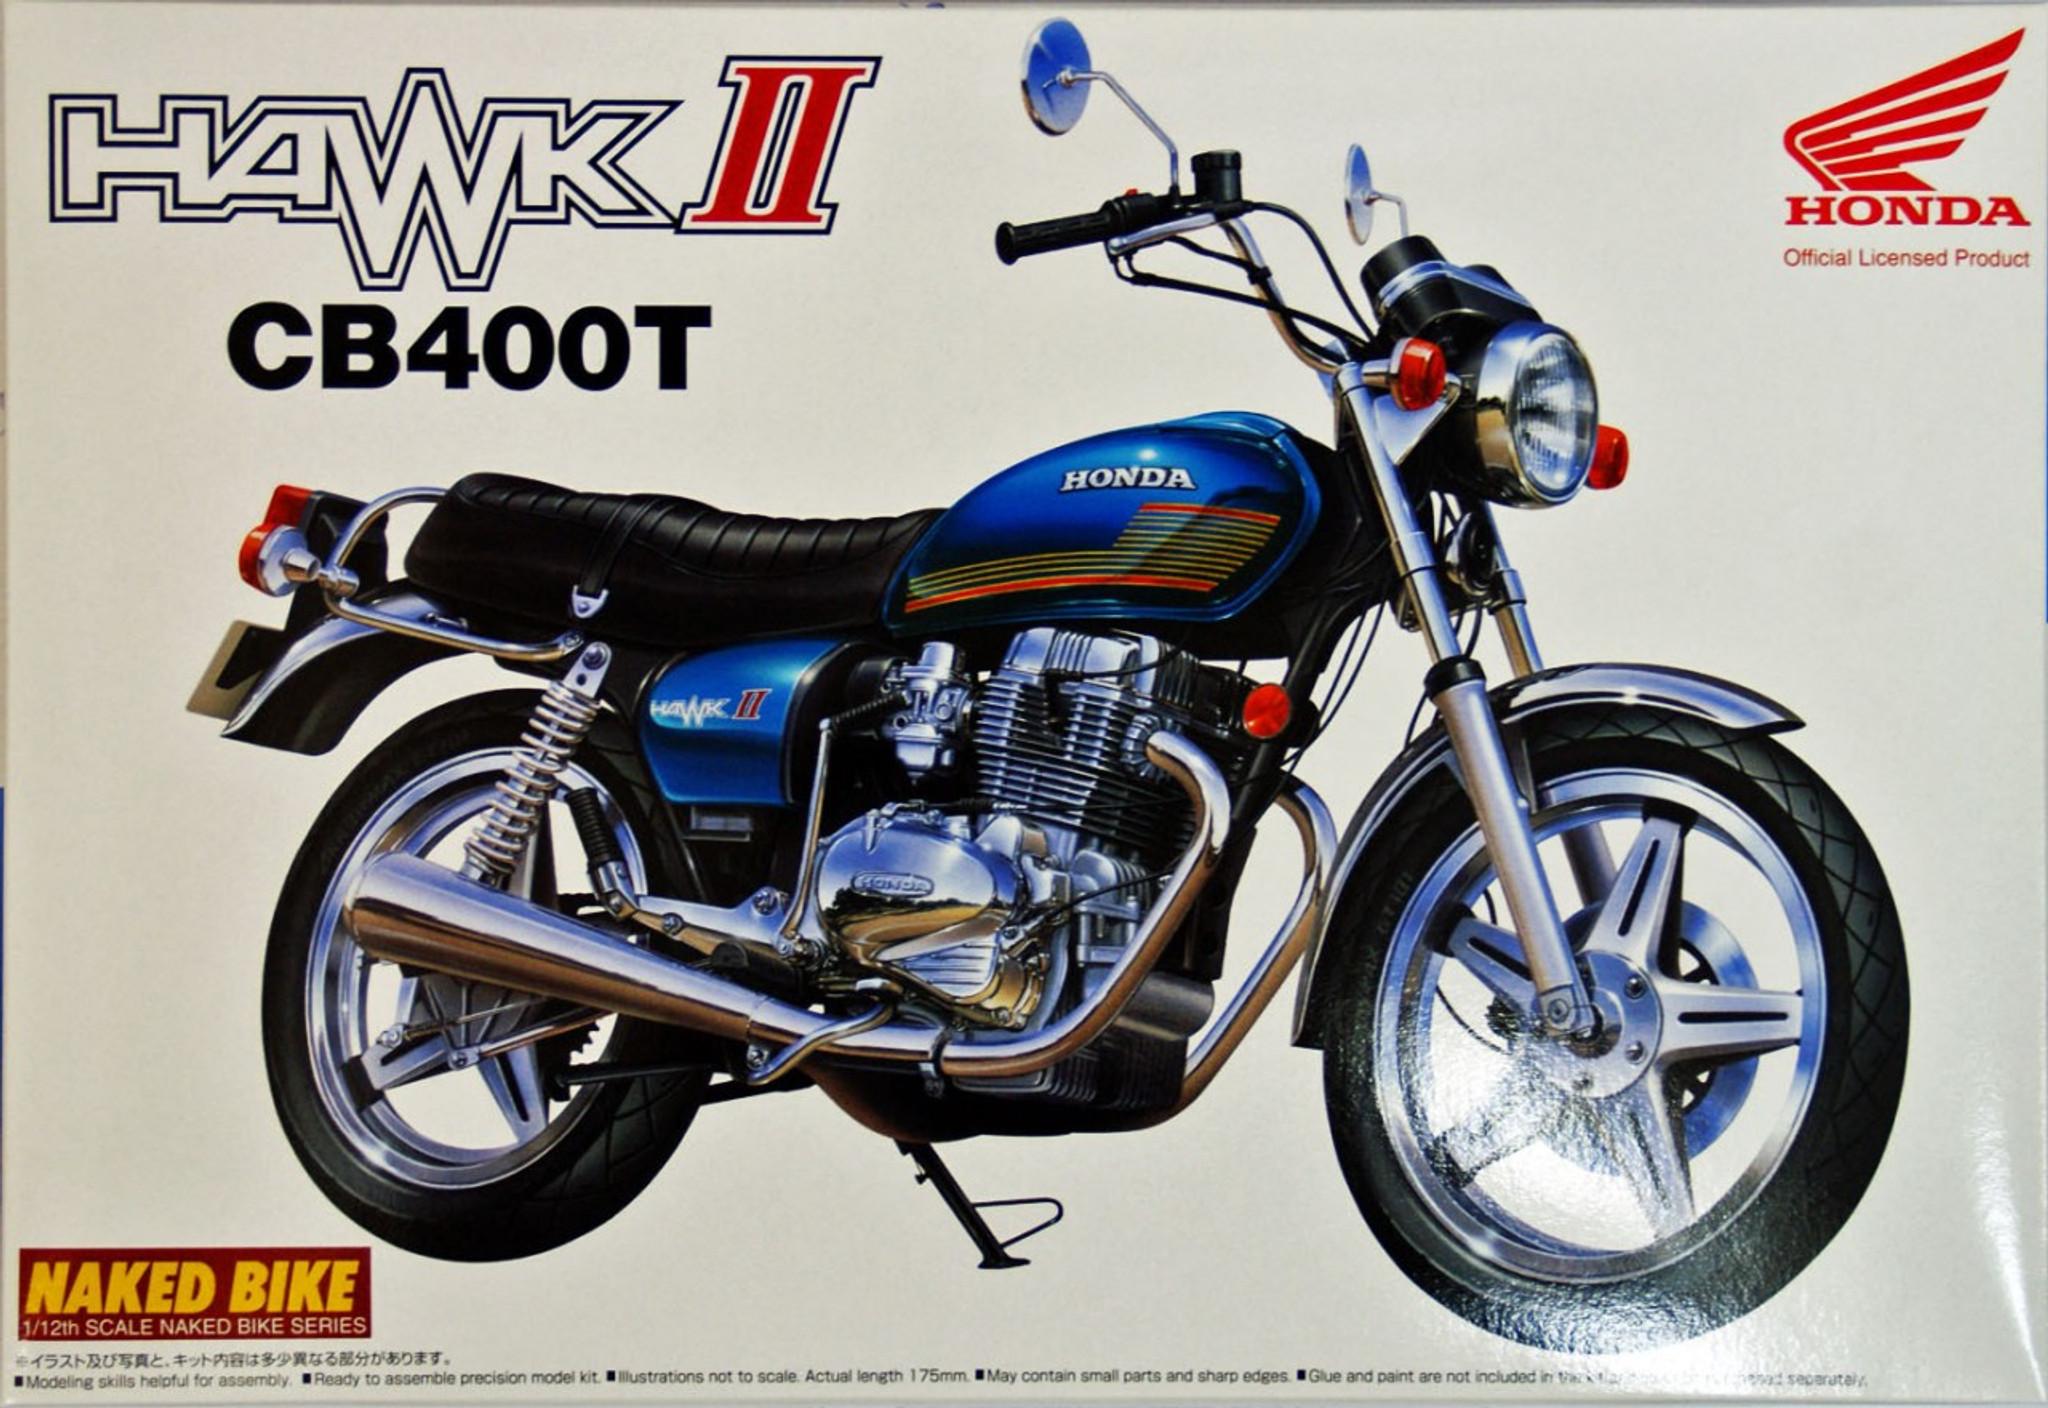 medium resolution of aoshima naked bike 66 47002 honda hawk ii cb400t 1 12 scale kit plaza japan